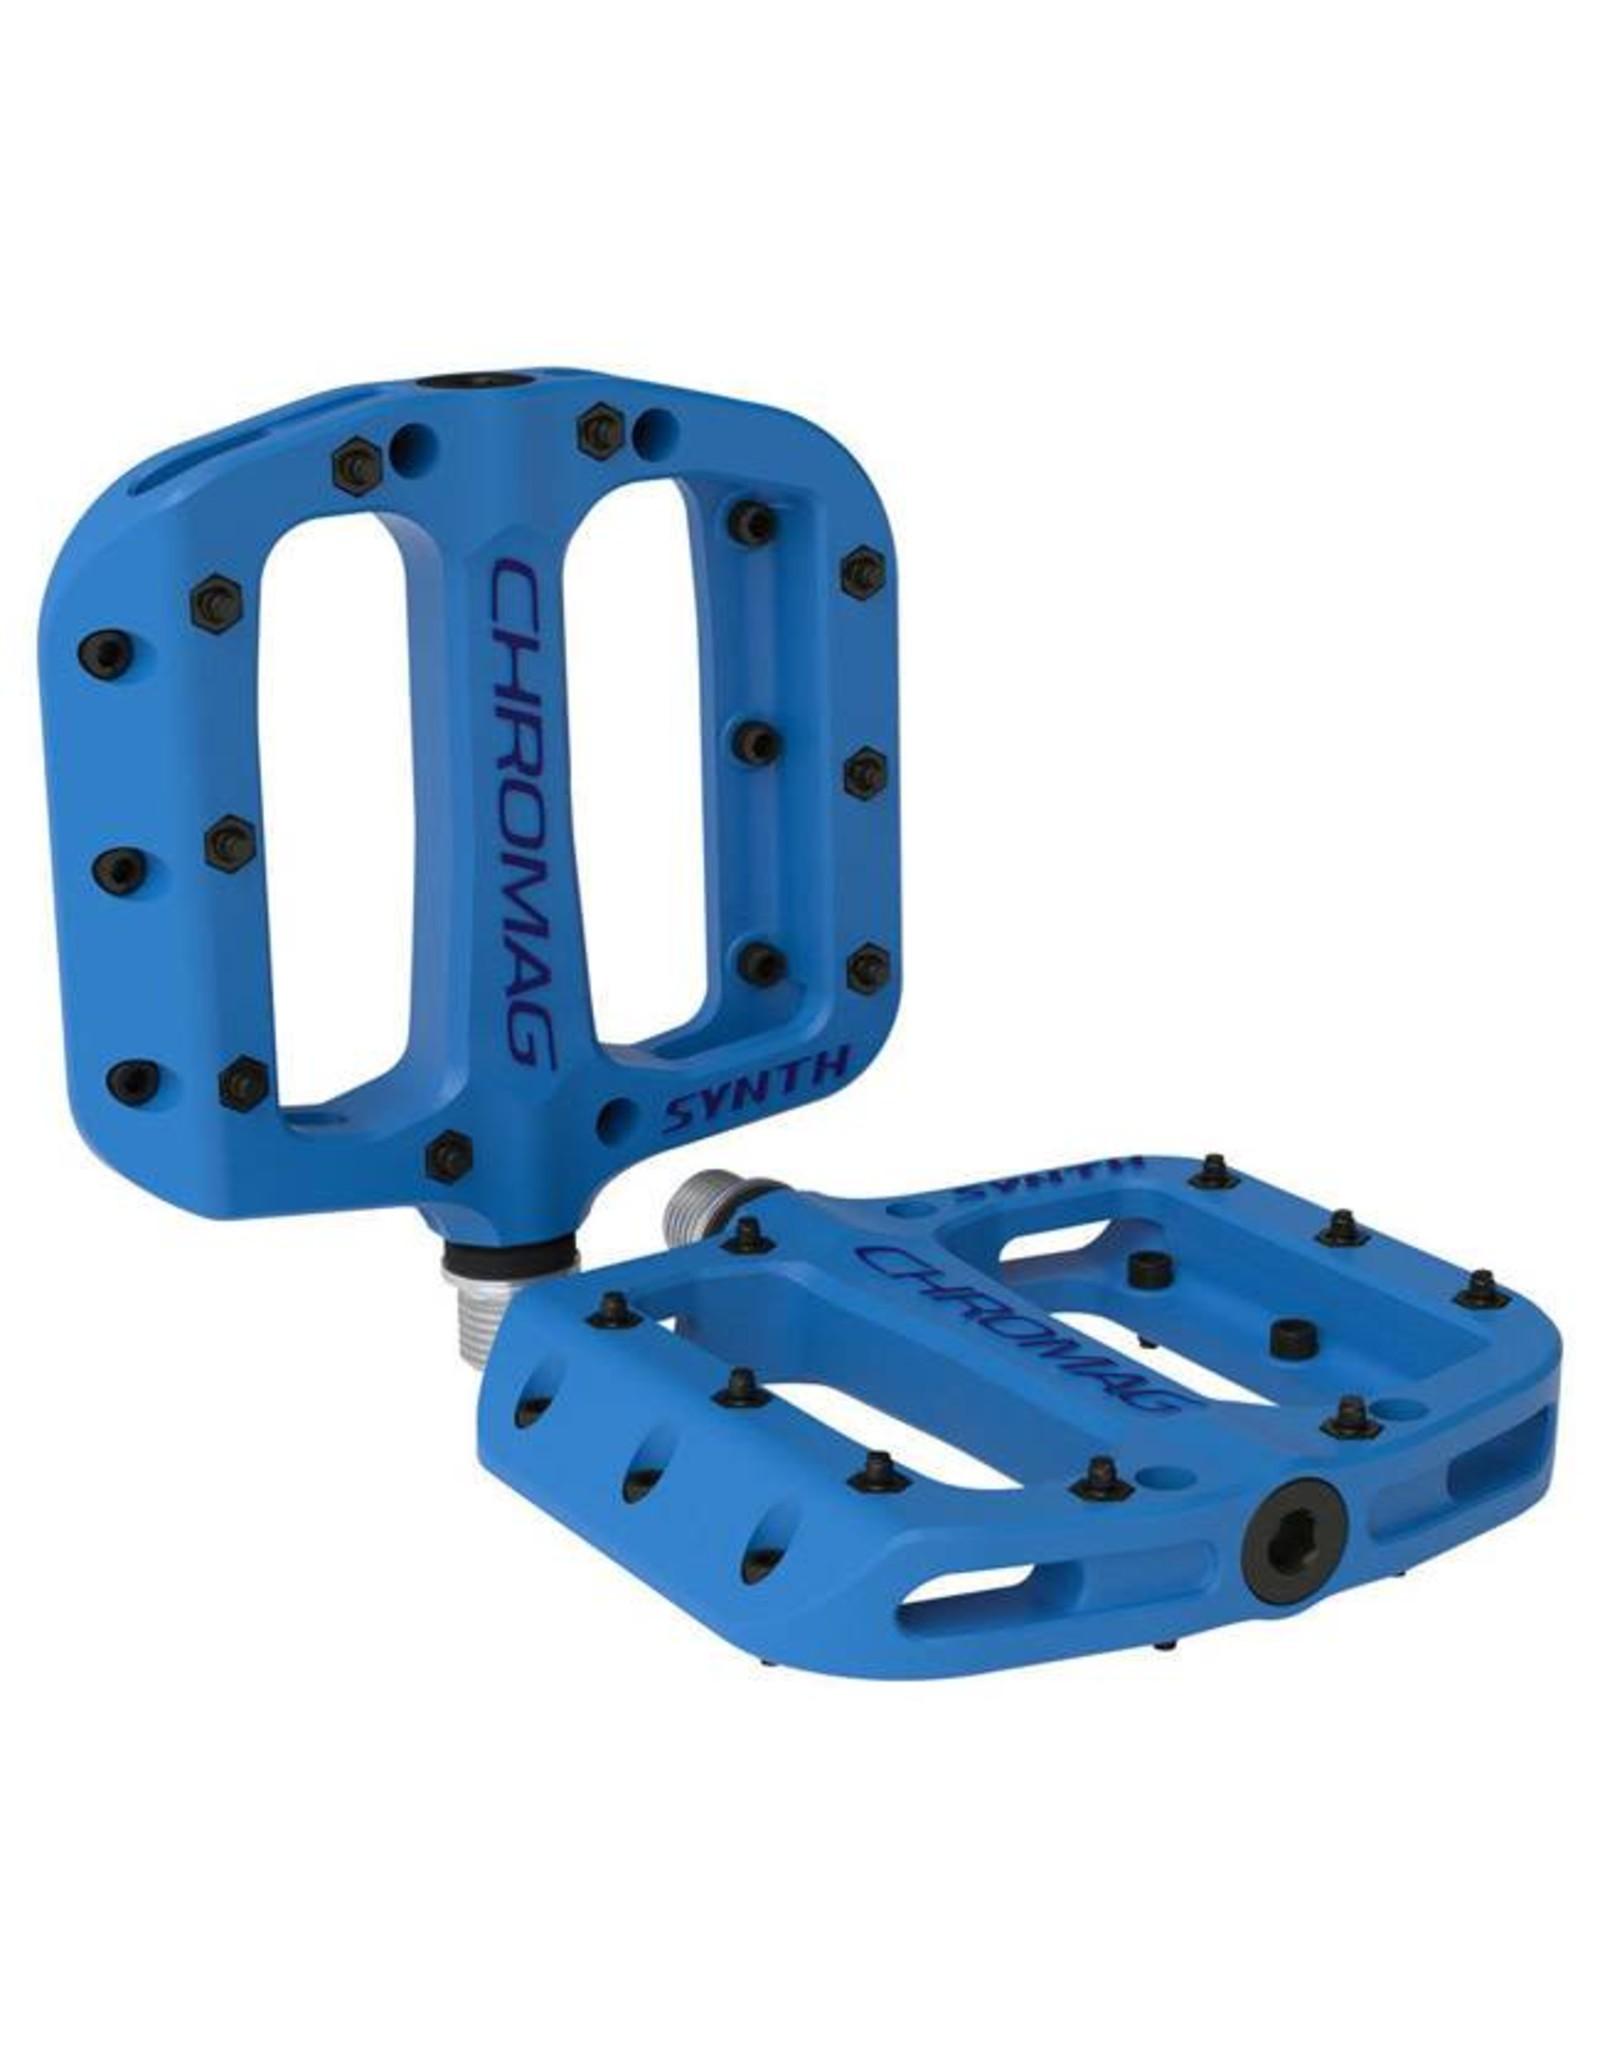 "Chromag Synth Composite Platform Pedals: 9/16"", Blue"